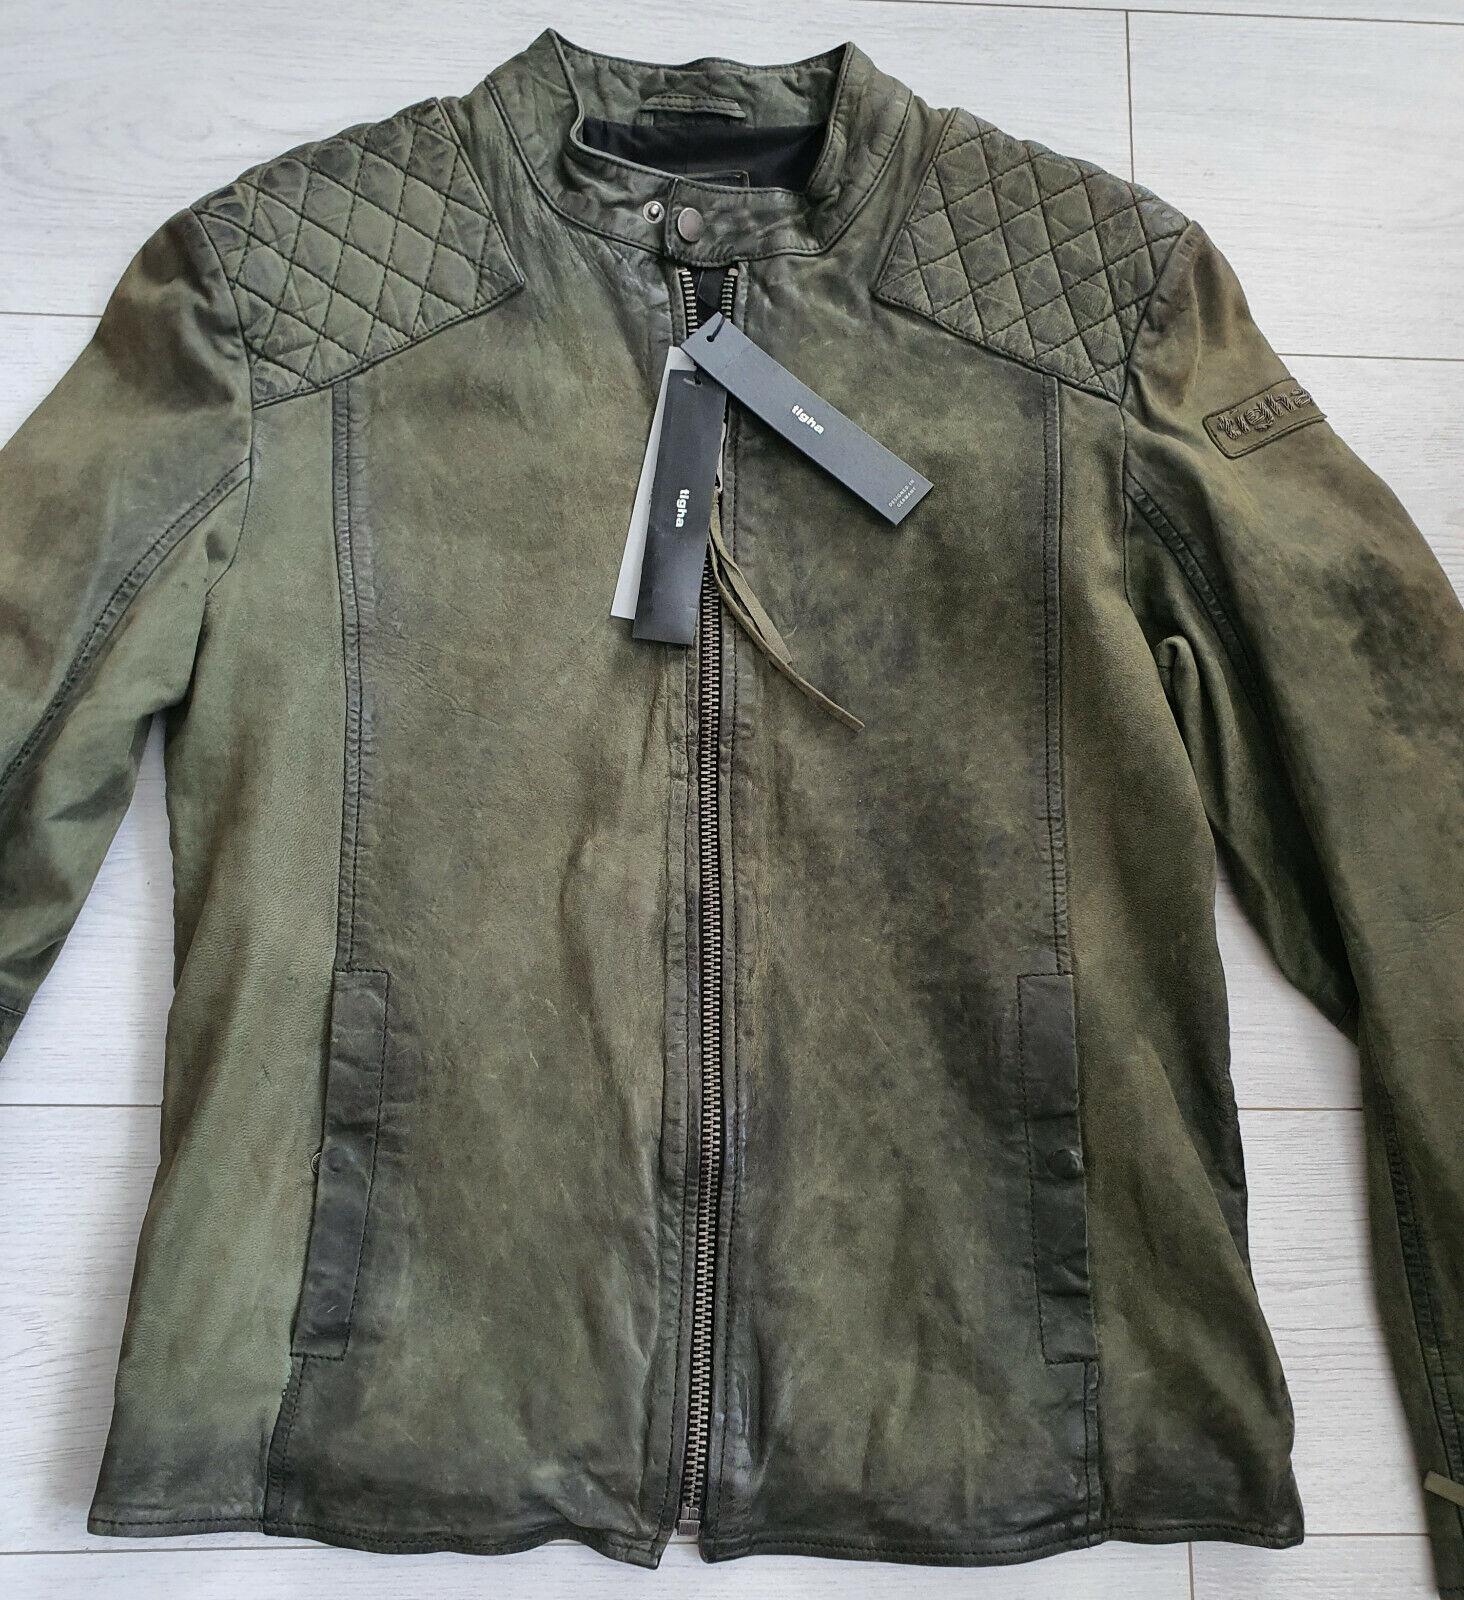 Tigha señores Biker chaqueta de cuero Nero Olive Sheep Leather size M